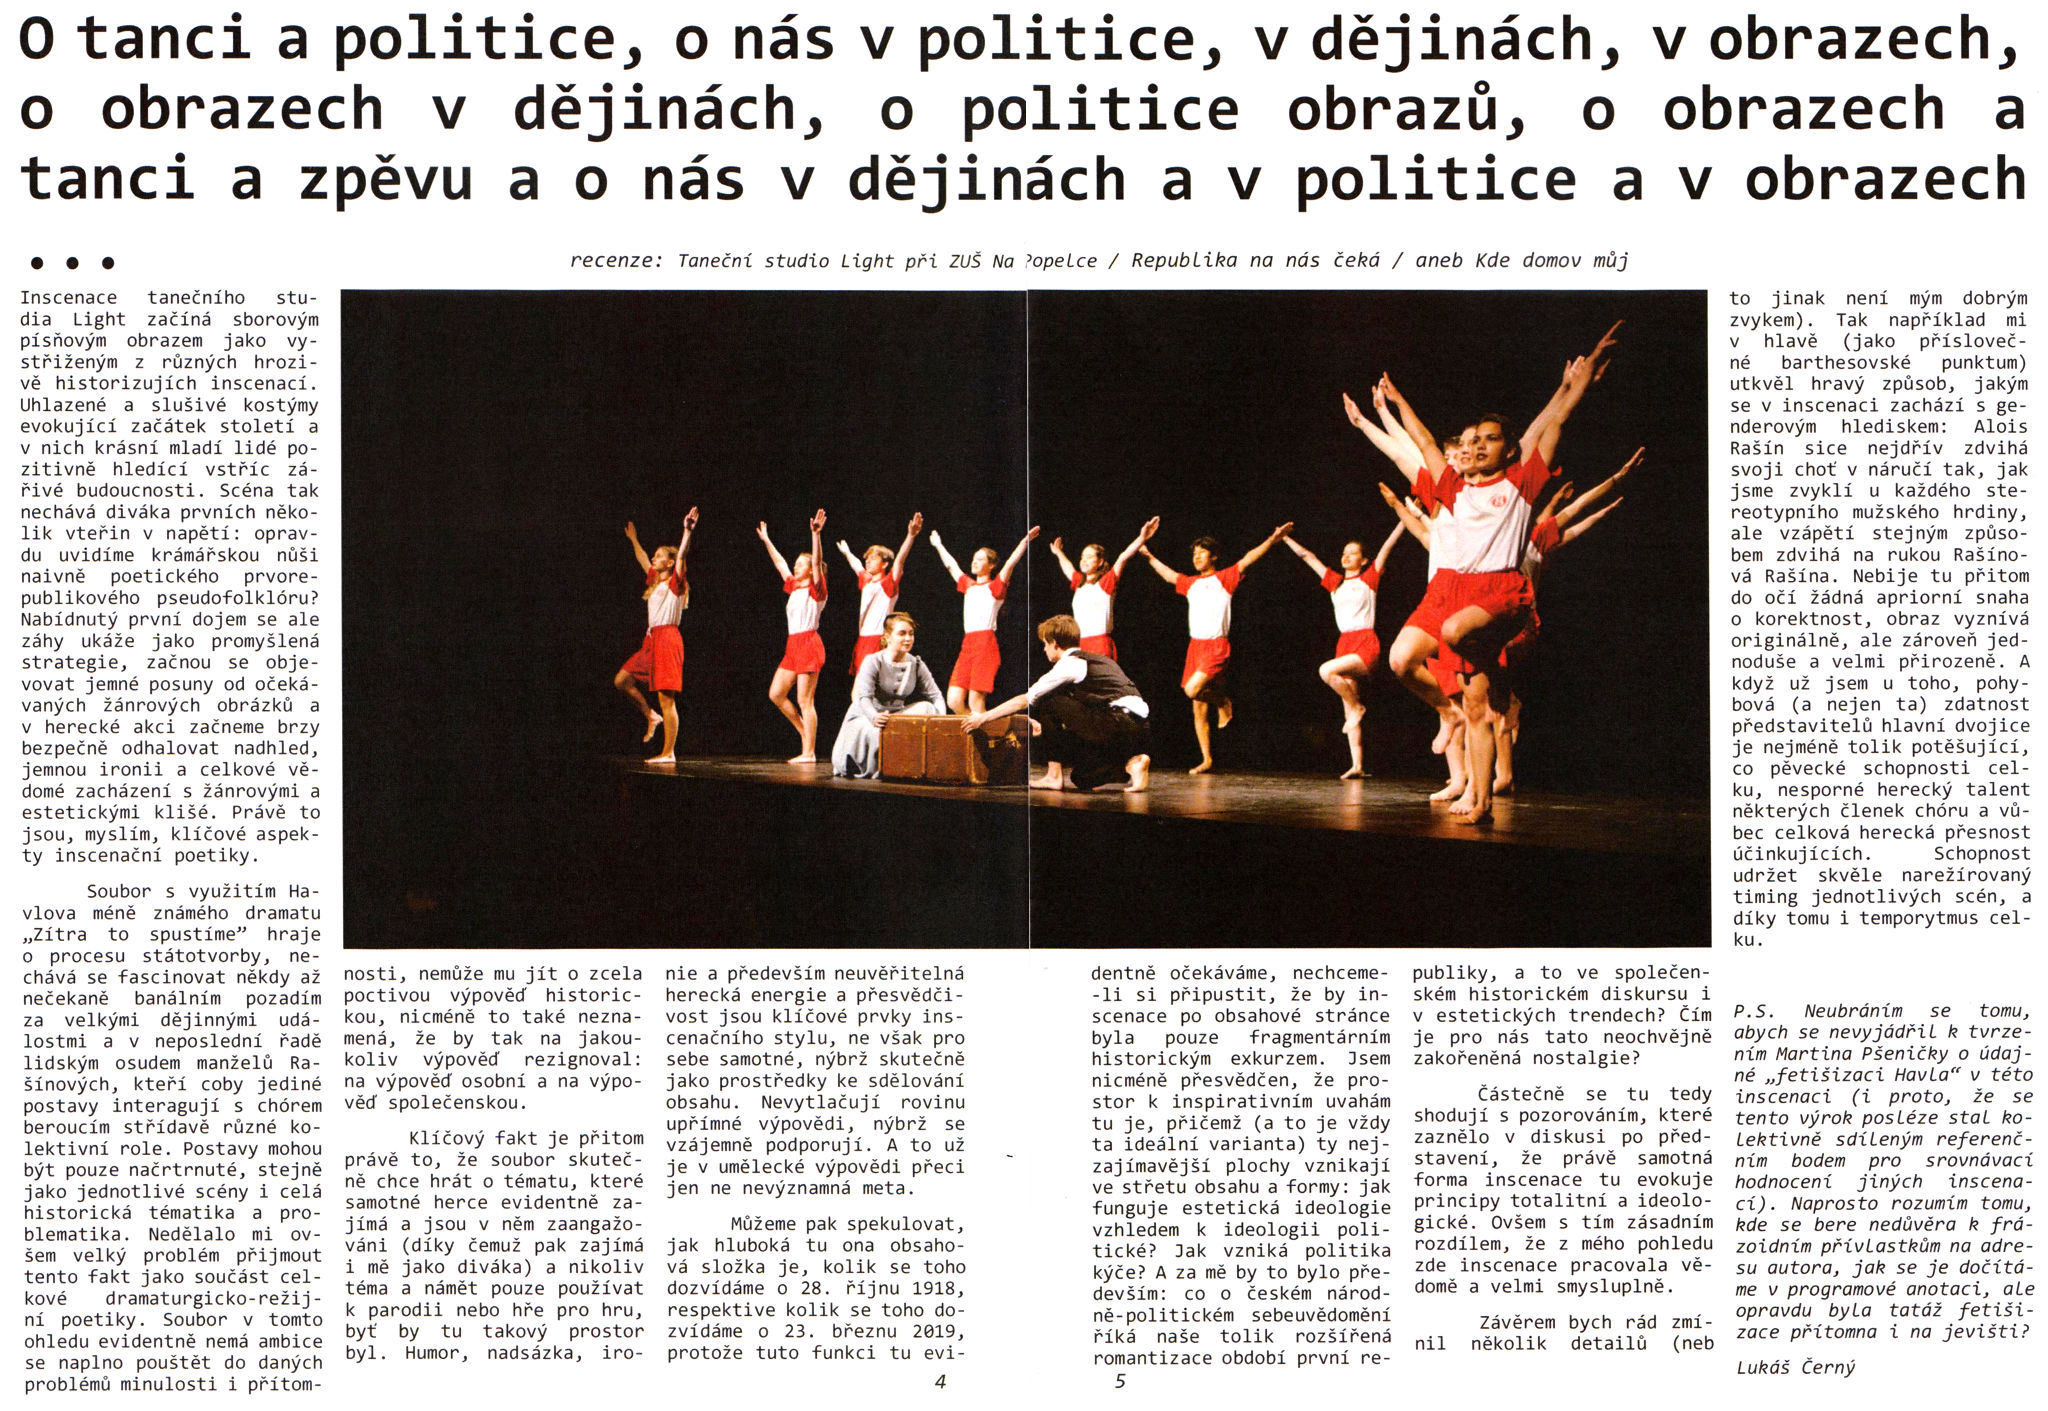 Zdroj: Zpravodaj Stodůleckého písečku 23. 3. 2019